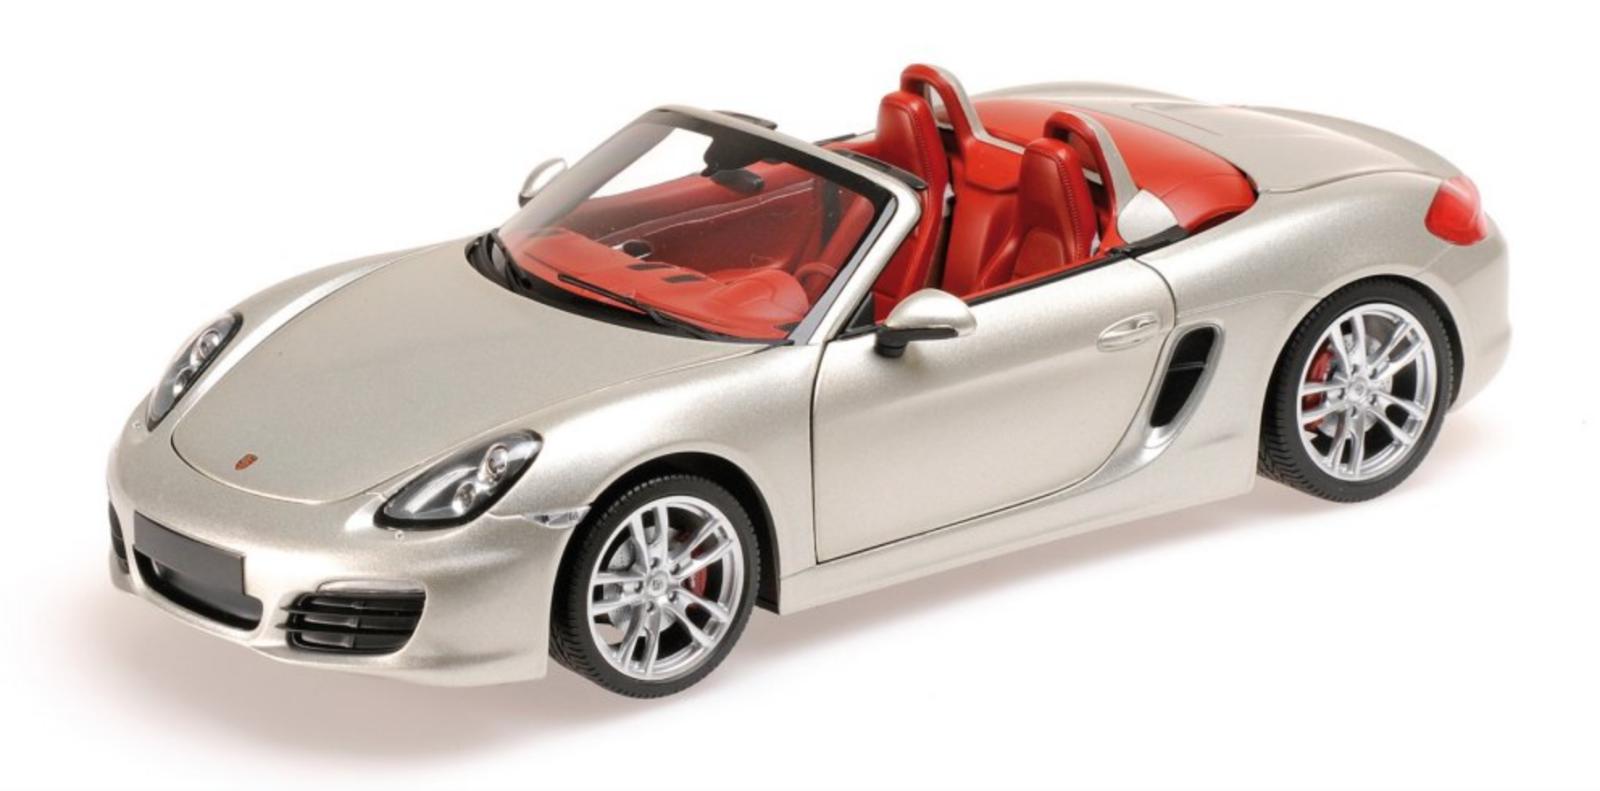 1 18 Porsche Boxster 2012 1 18 • Minichamps 110062030